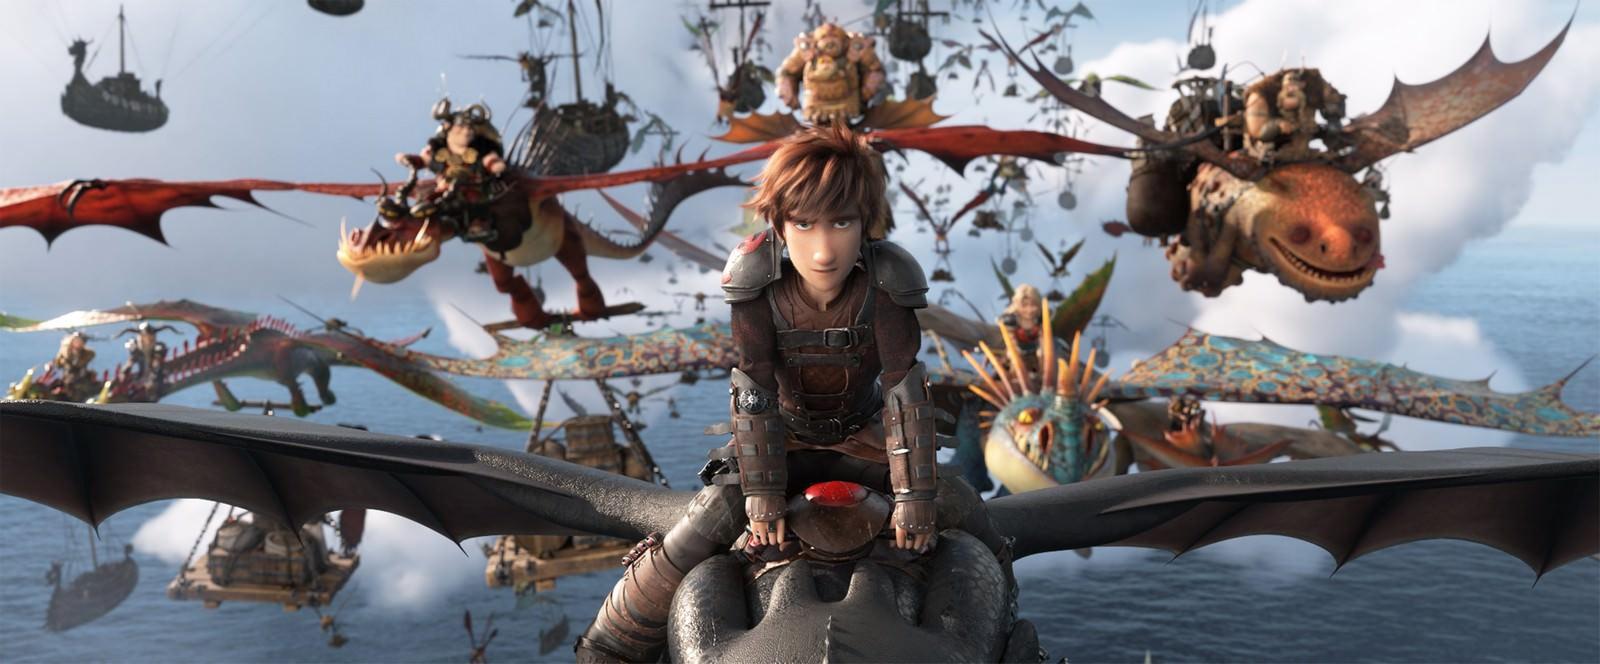 Movie, How to Train Your Dragon: The Hidden World(美國, 2019年) / 馴龍高手3(台灣) /馴龍記3(香港) / 驯龙高手3(中國), 電影畫面